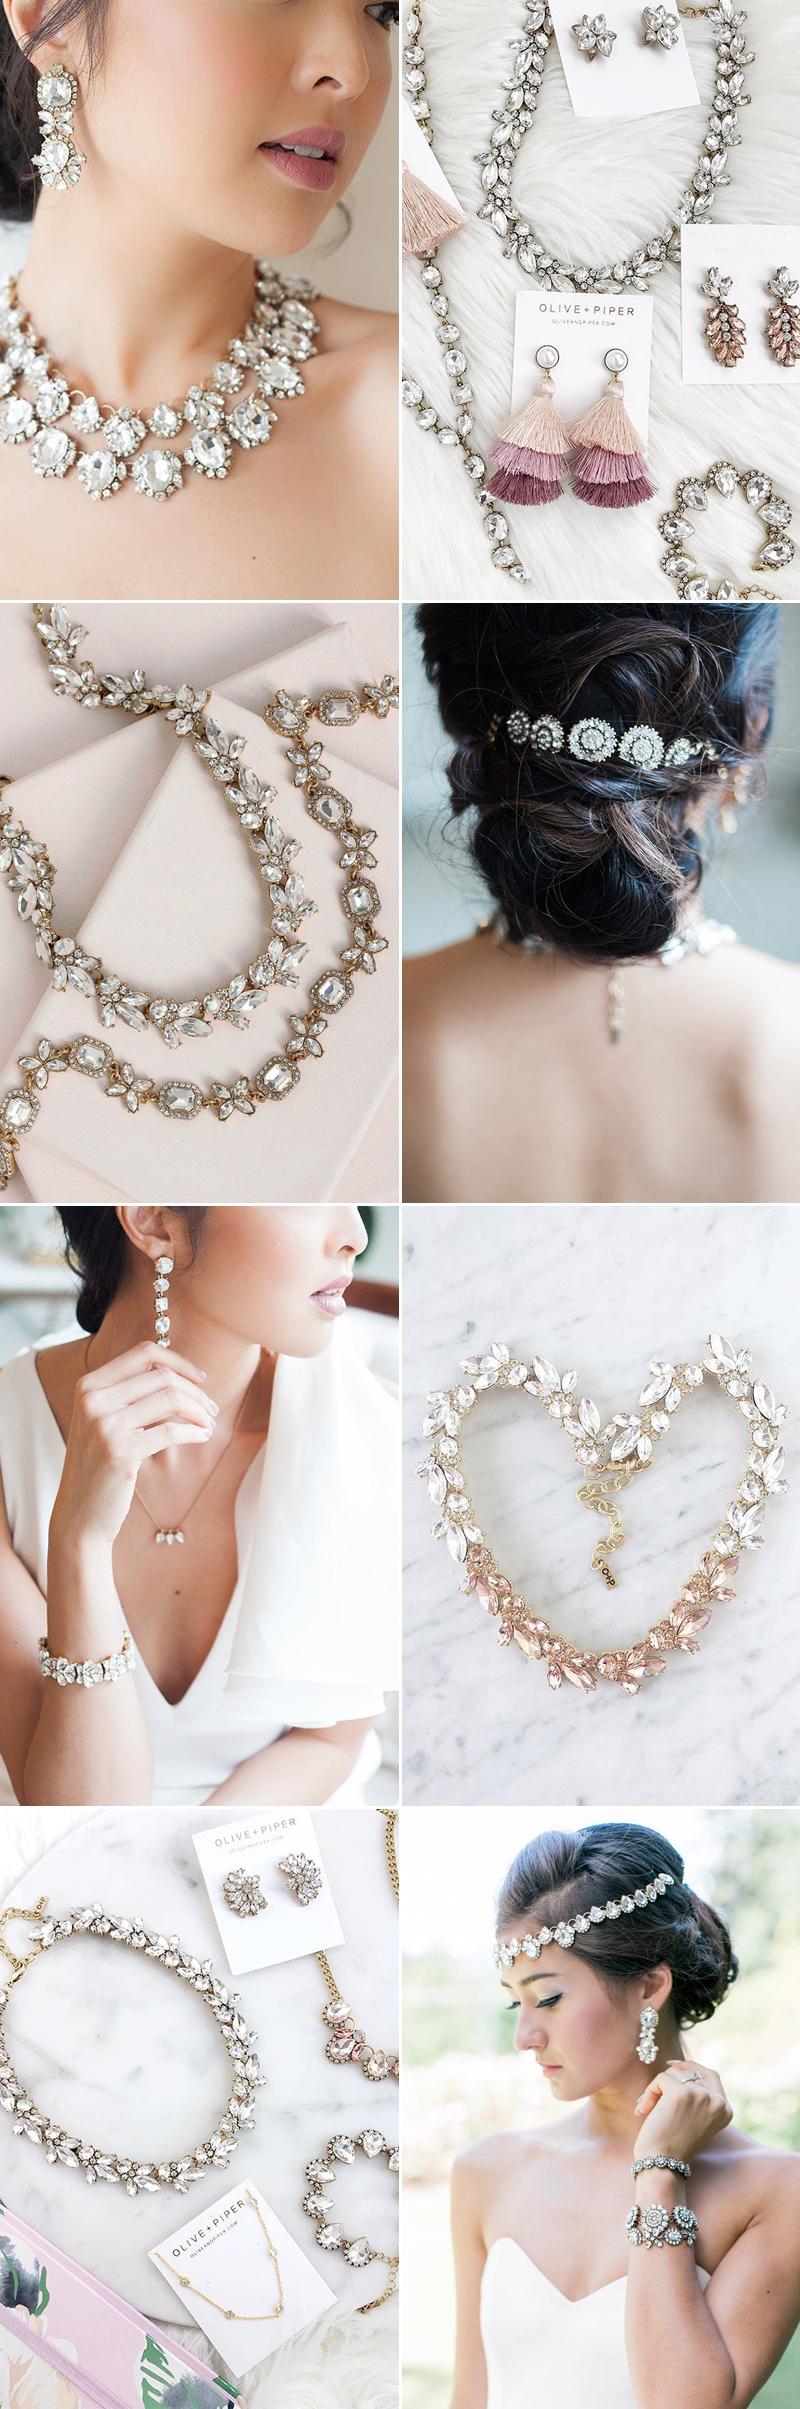 bridaljewelry01-oliveandpiper